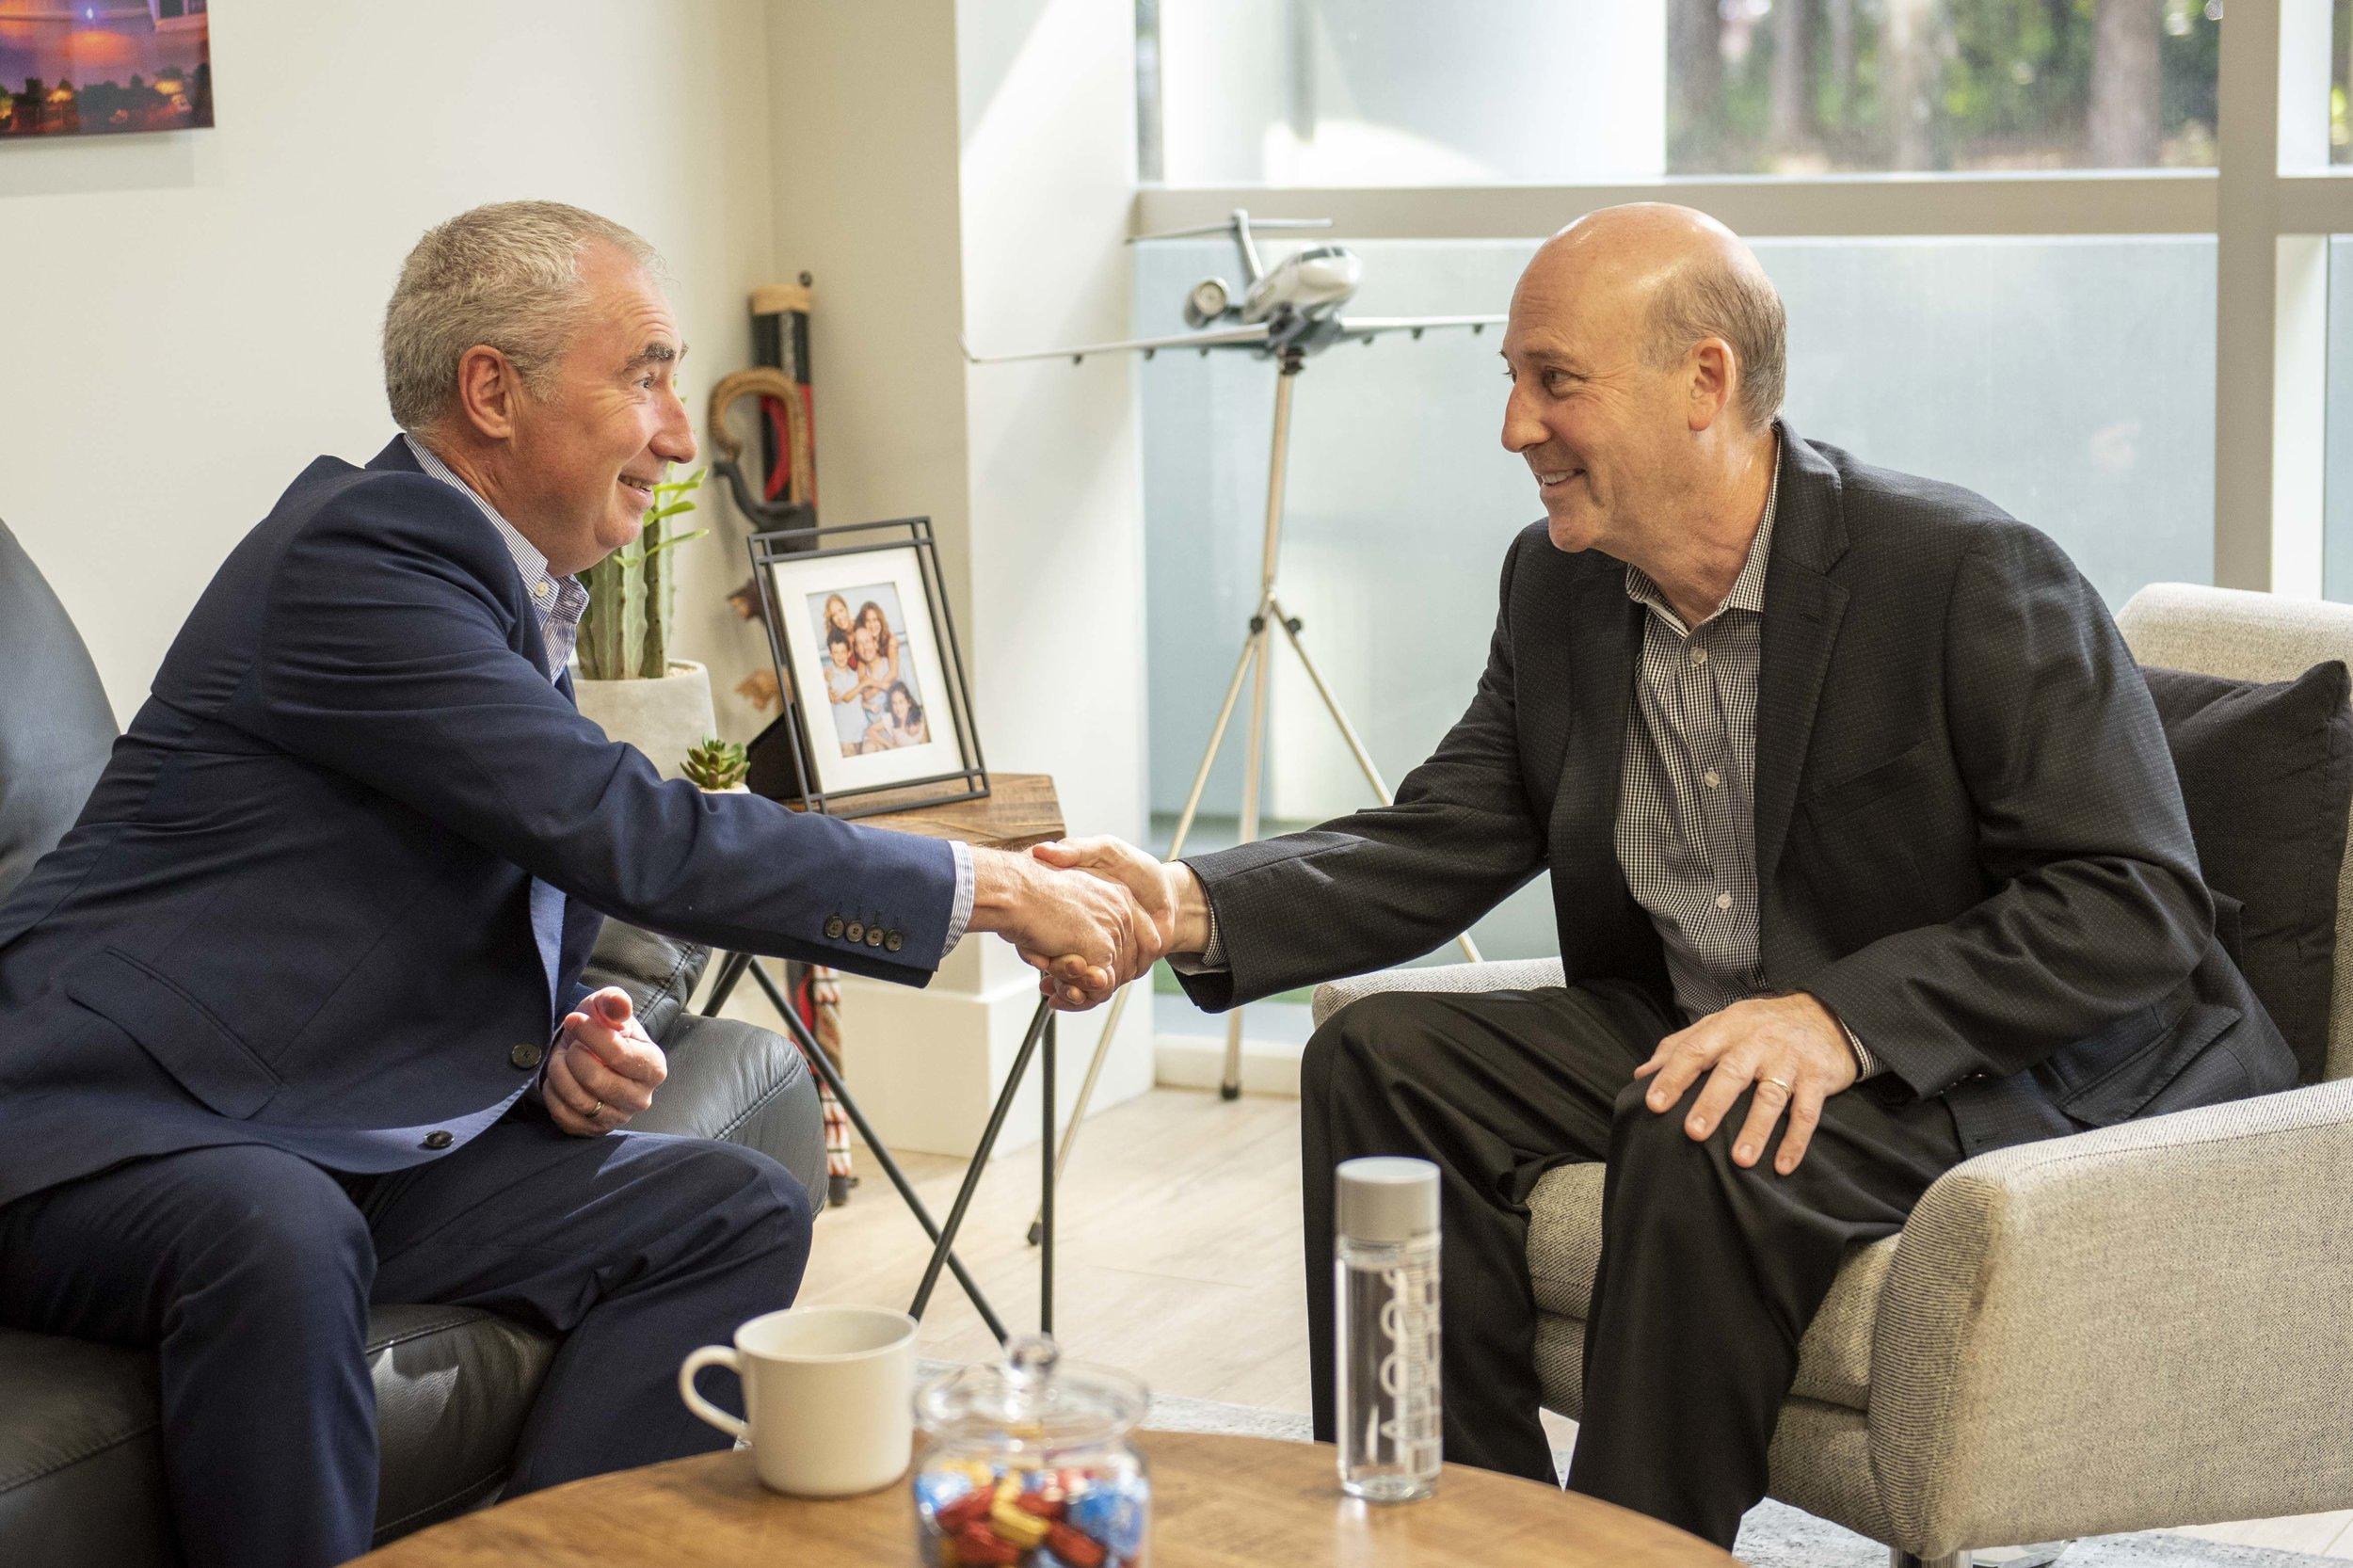 Paul & Les Handshake.jpg